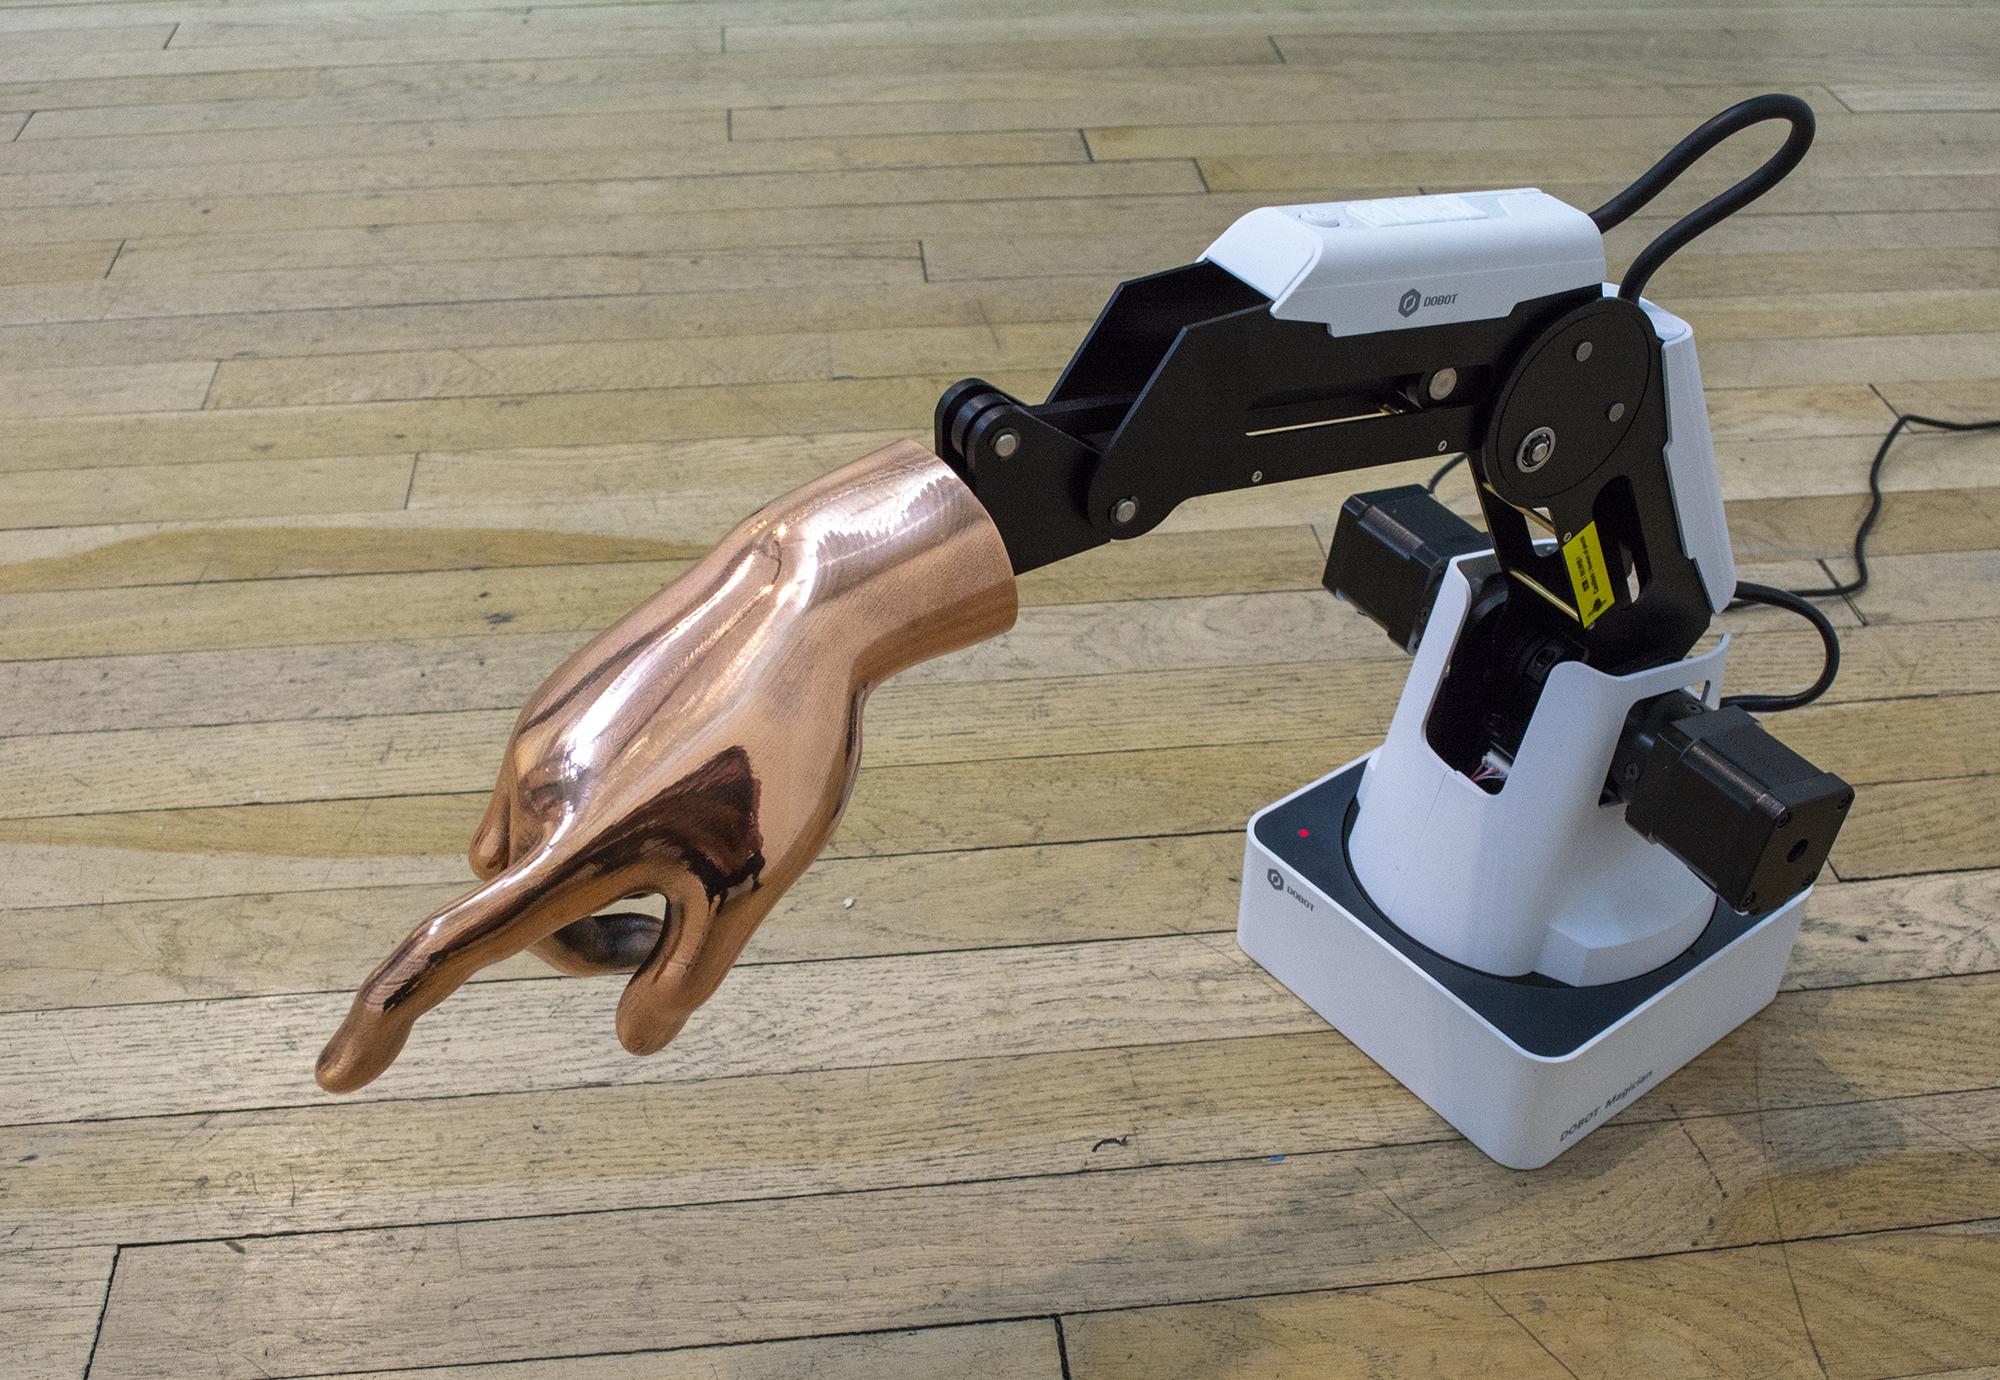 Amanda Turner Pohan  ololyga, ololyzo, eleleu, elelizo, alala, alalazo, io!  2019 DoBot® Magician Robotic Arm, 3D printed and bronze electroplated hand of Calliope 24 x 10 x 14 inches